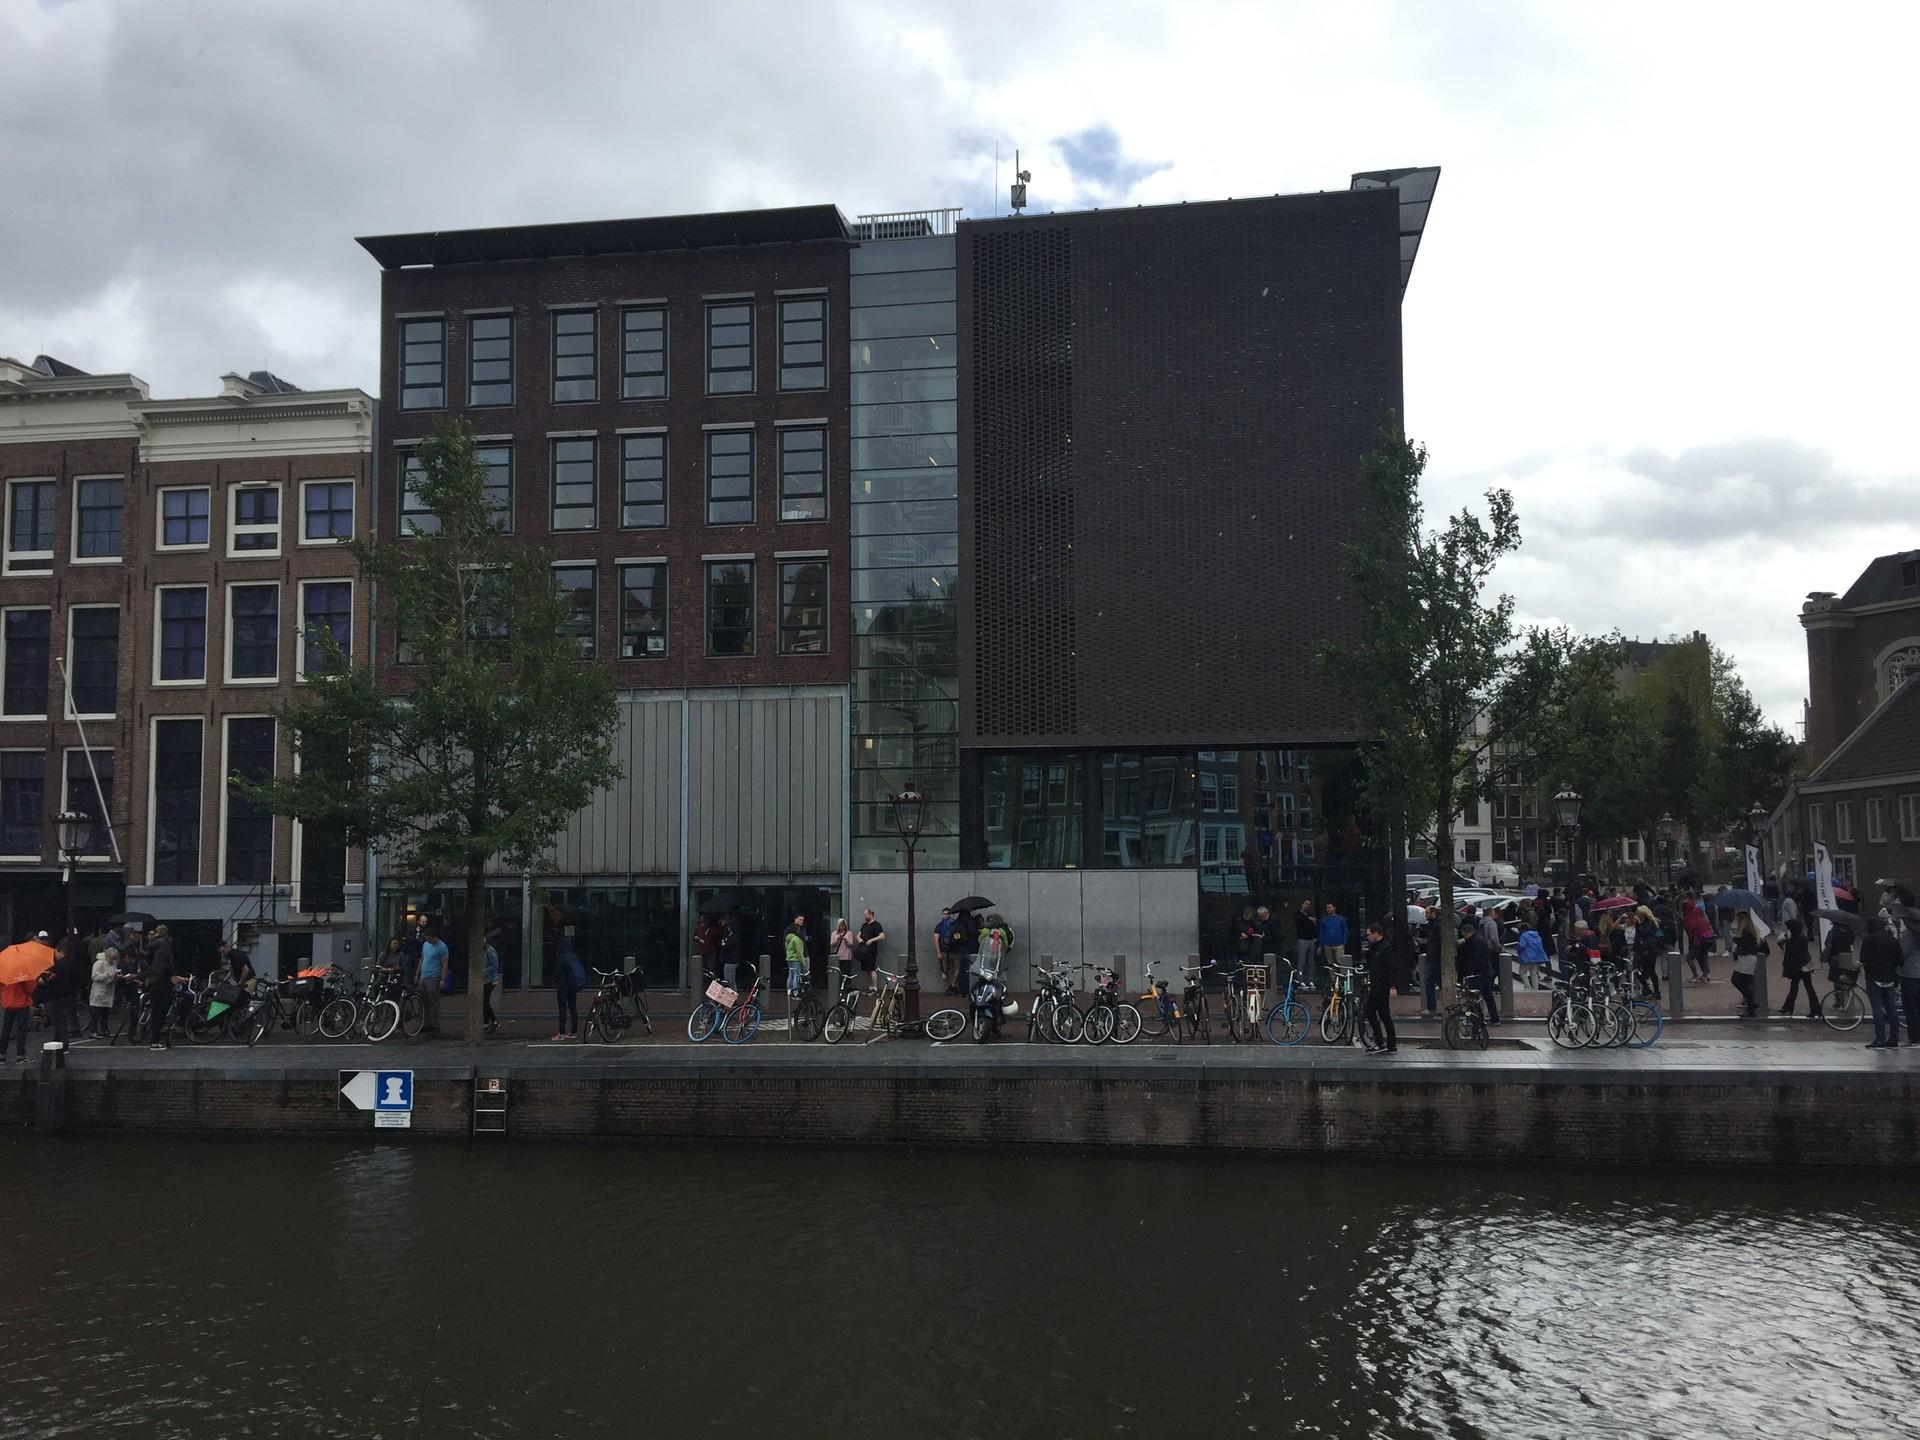 the-10-best-museums-amsterdam-6388e0b10d